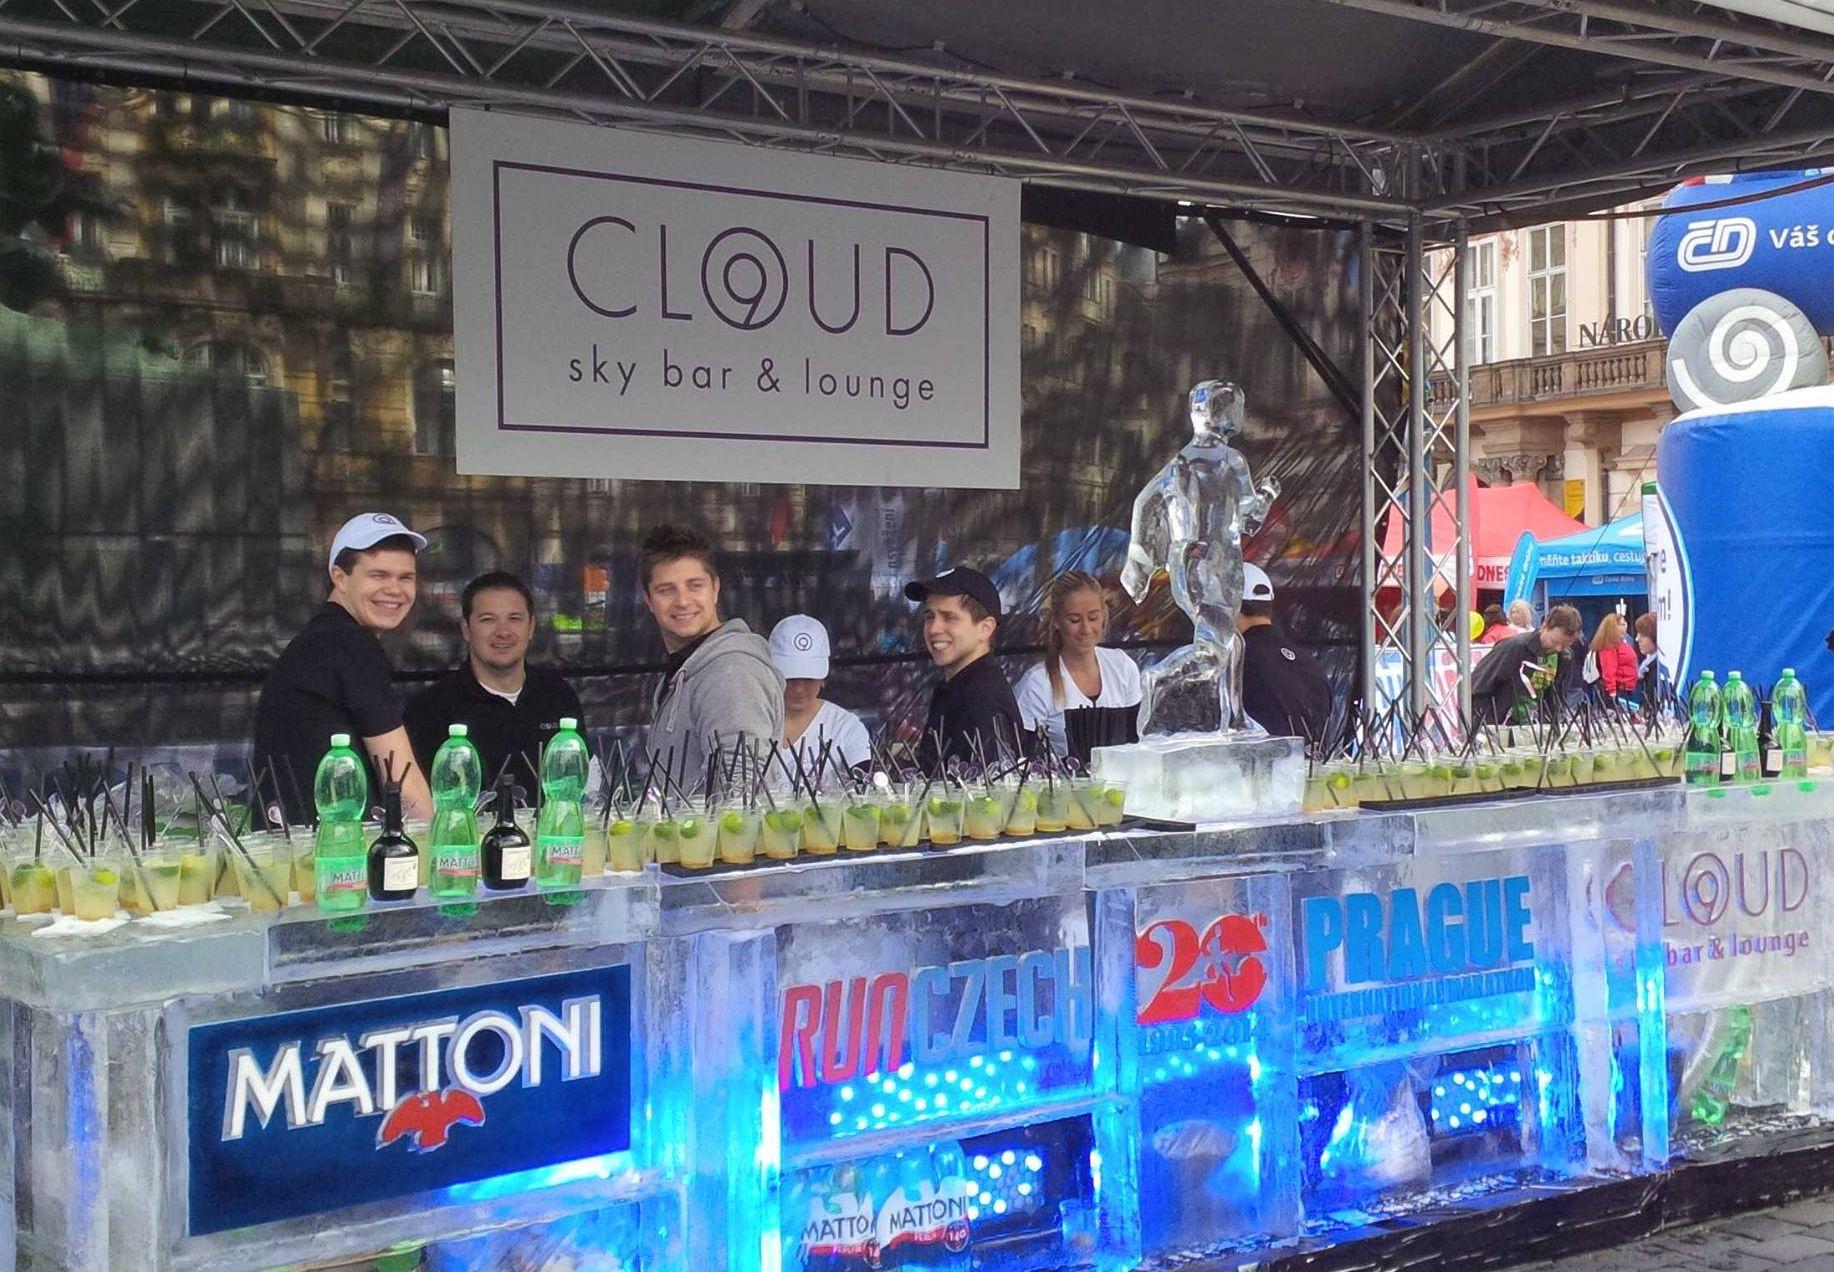 Zdroj: Cloud 9 sky bar & lounge